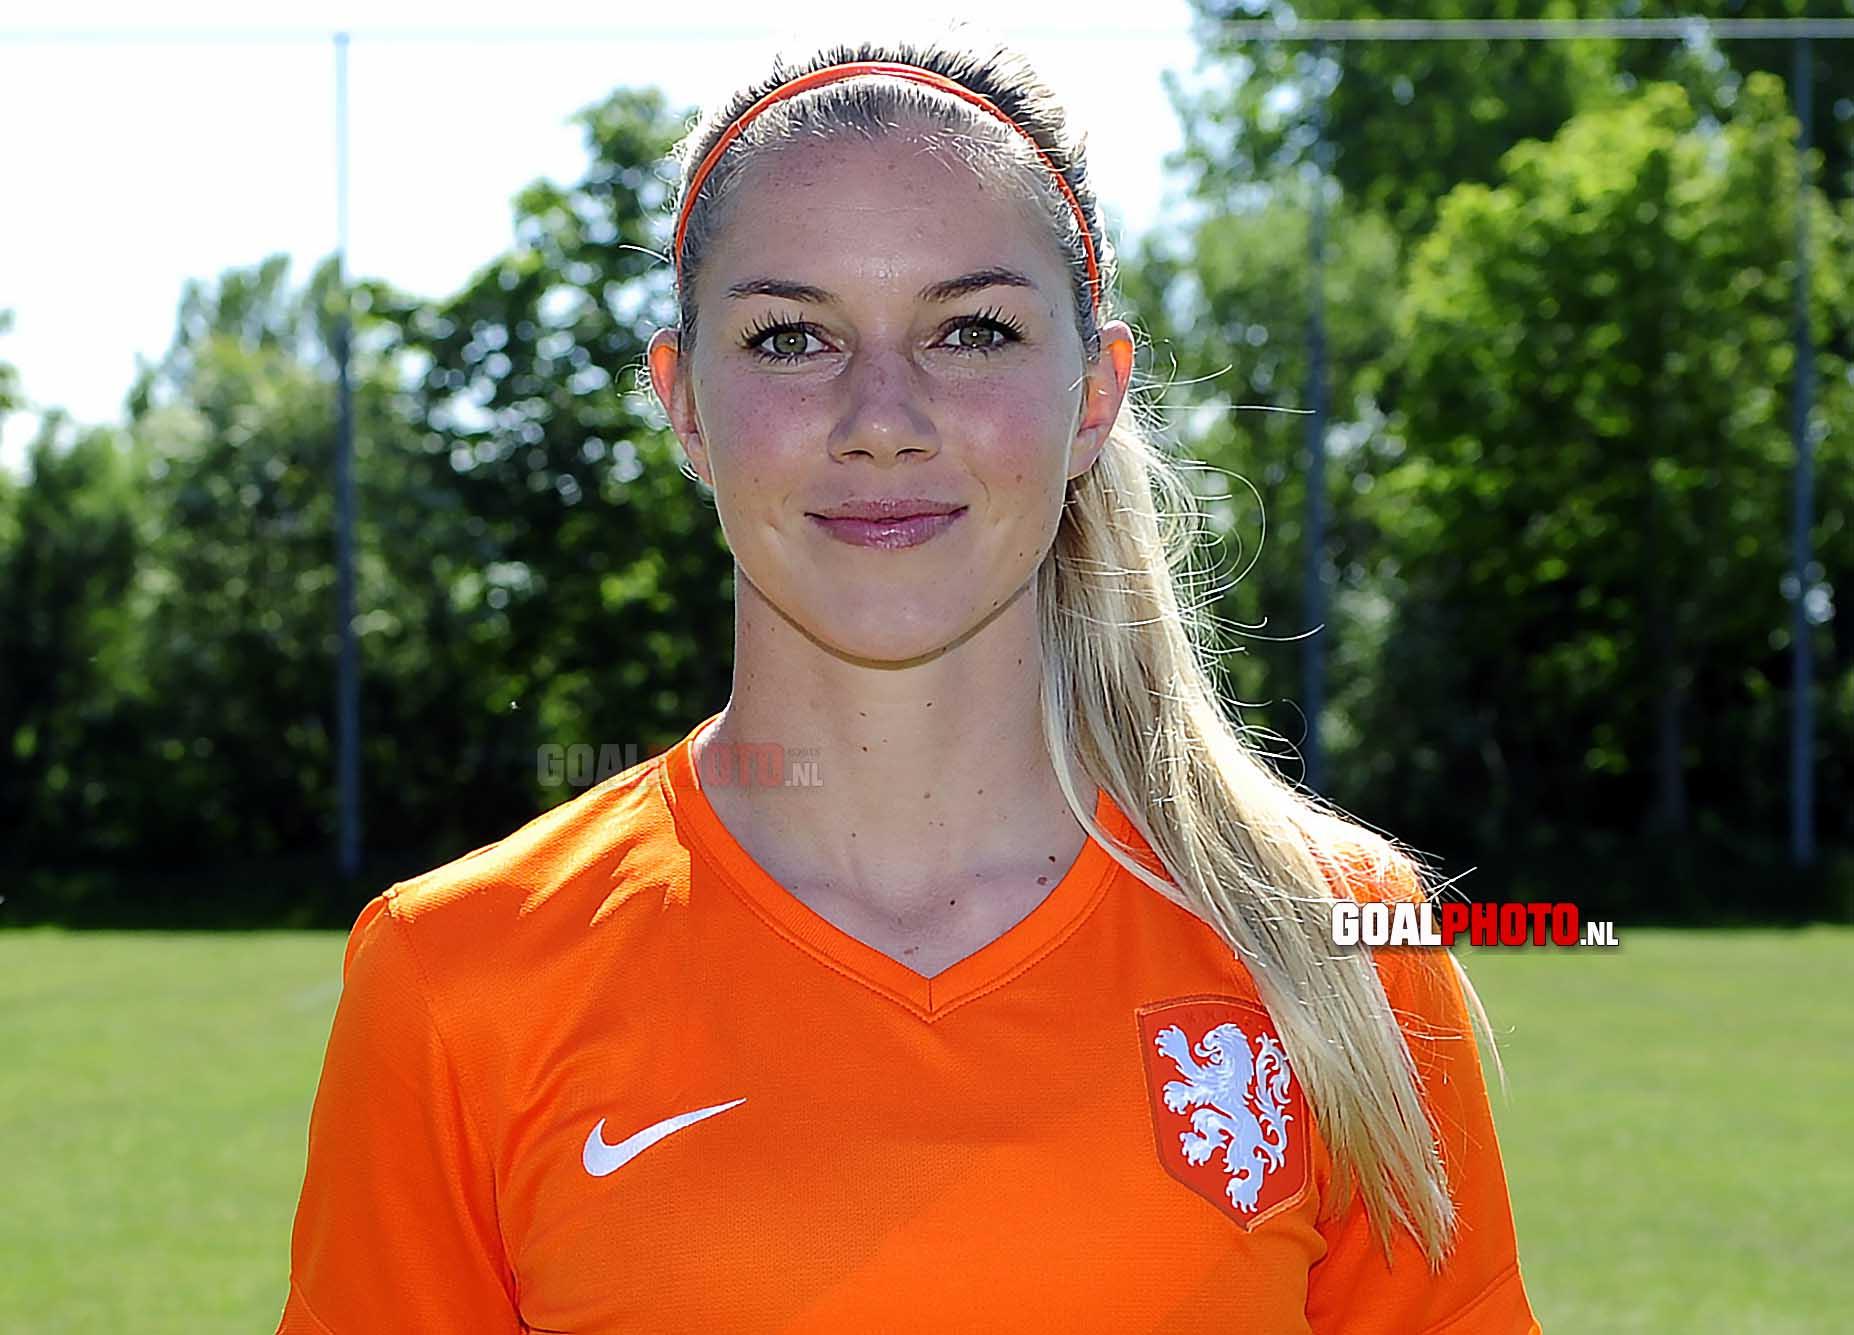 Anouk Hoogendijk ambassadrice Welpenvoetbal